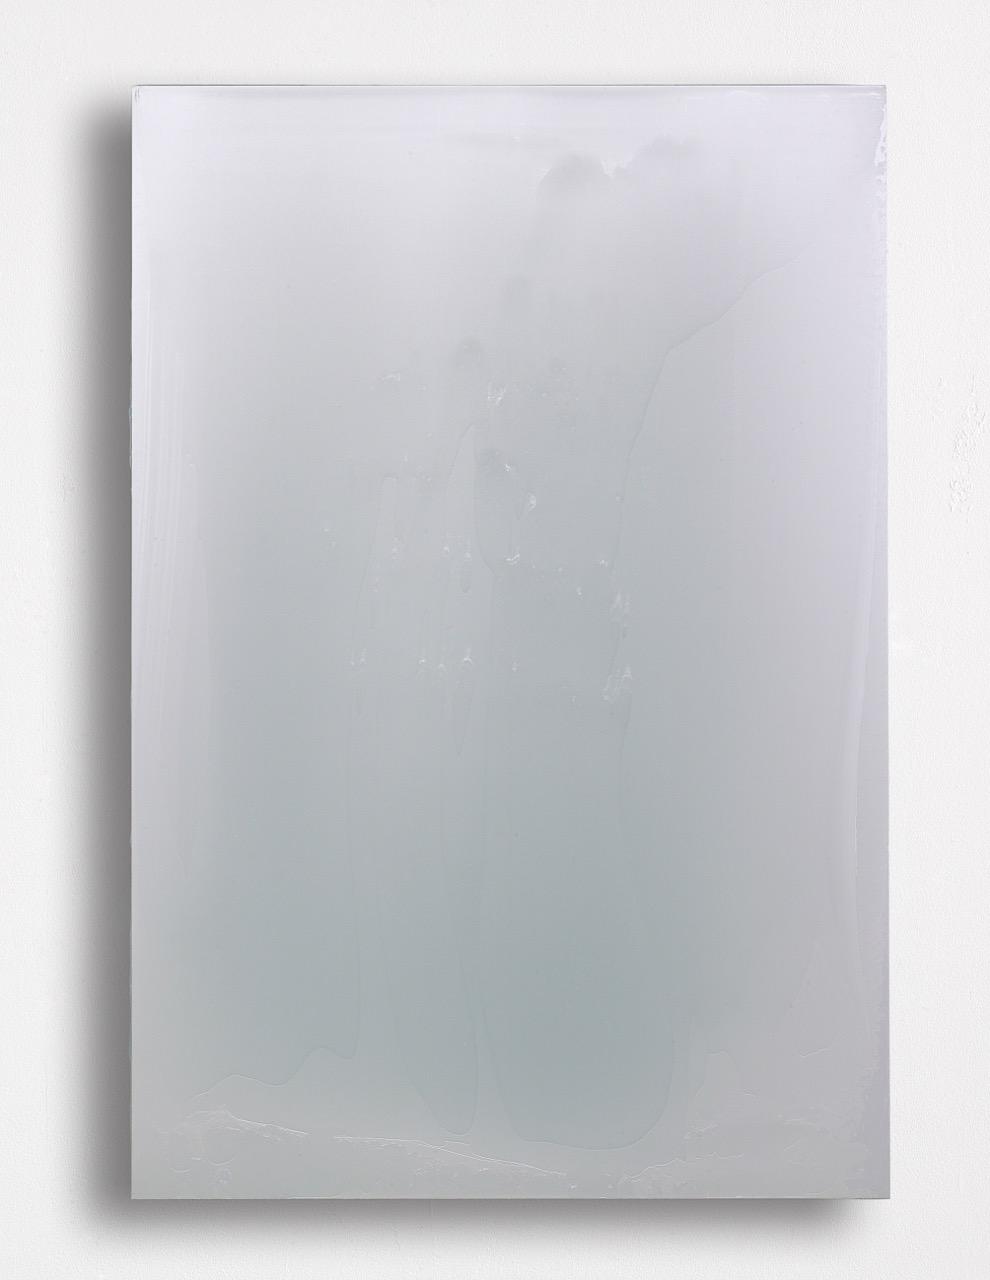 Untitled, 2007, 90x62cm.jpg